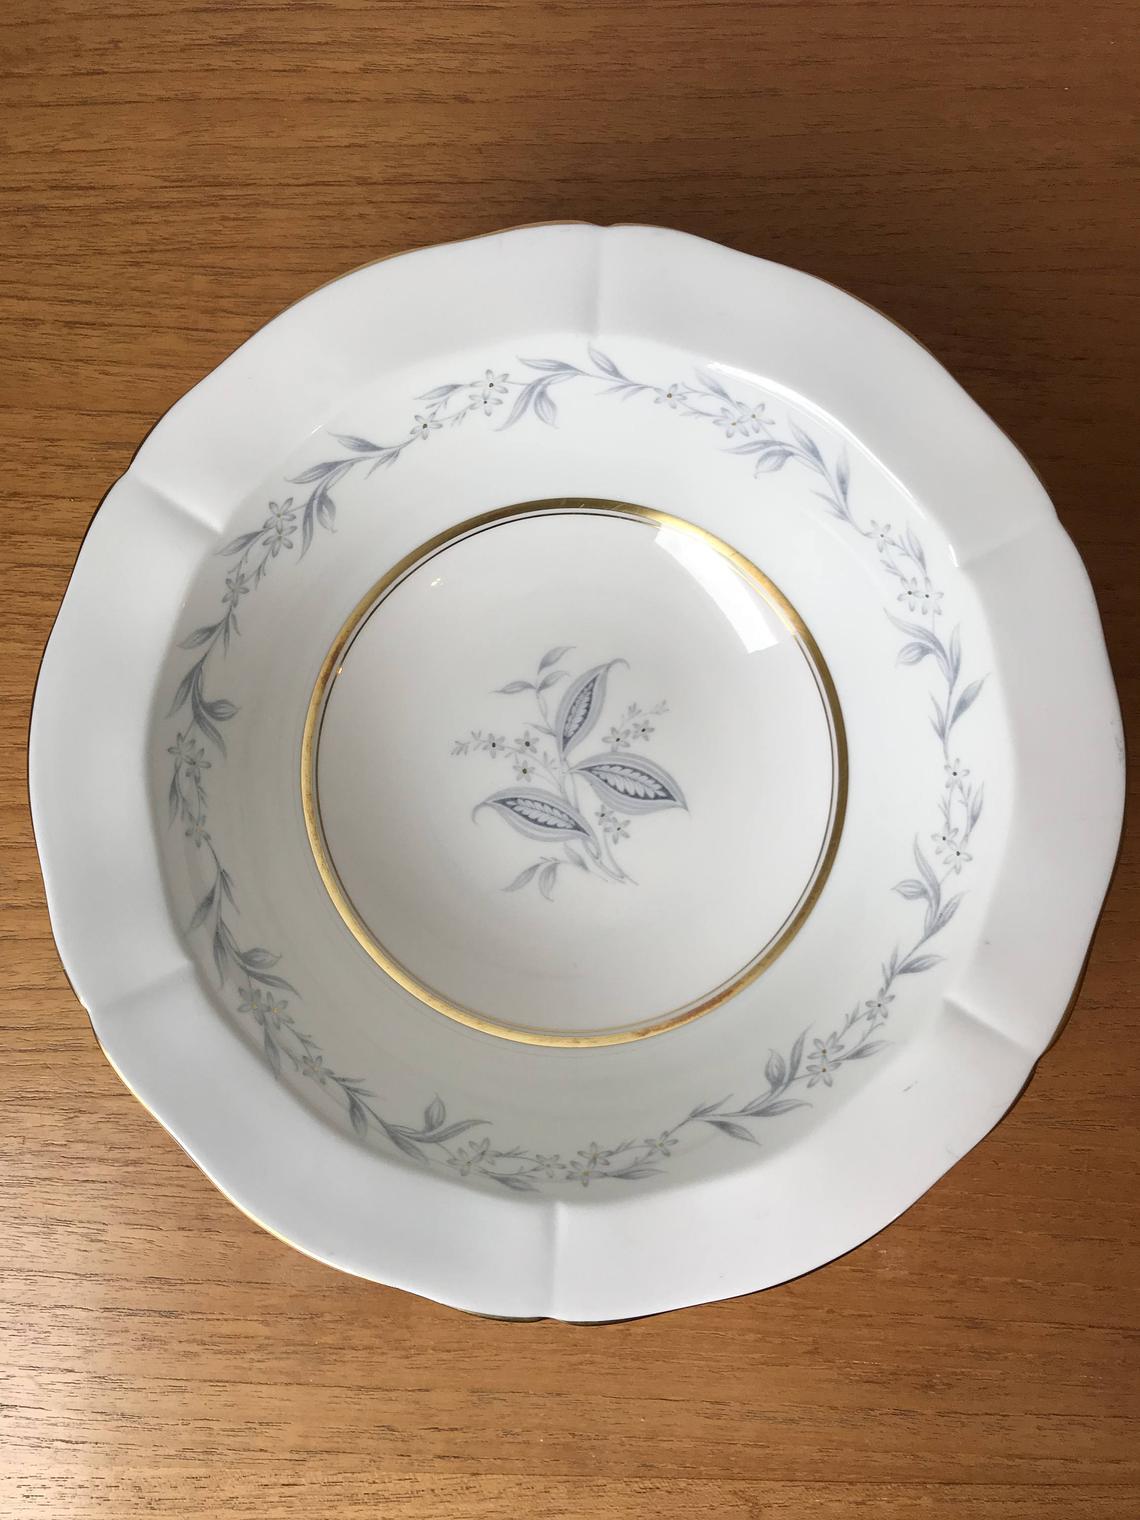 "Vintage Northumbria ""Morning Mist"" Serving Bowl, Light Blue Grey Leaves Gold Accents Bone China Vegetable Dish"